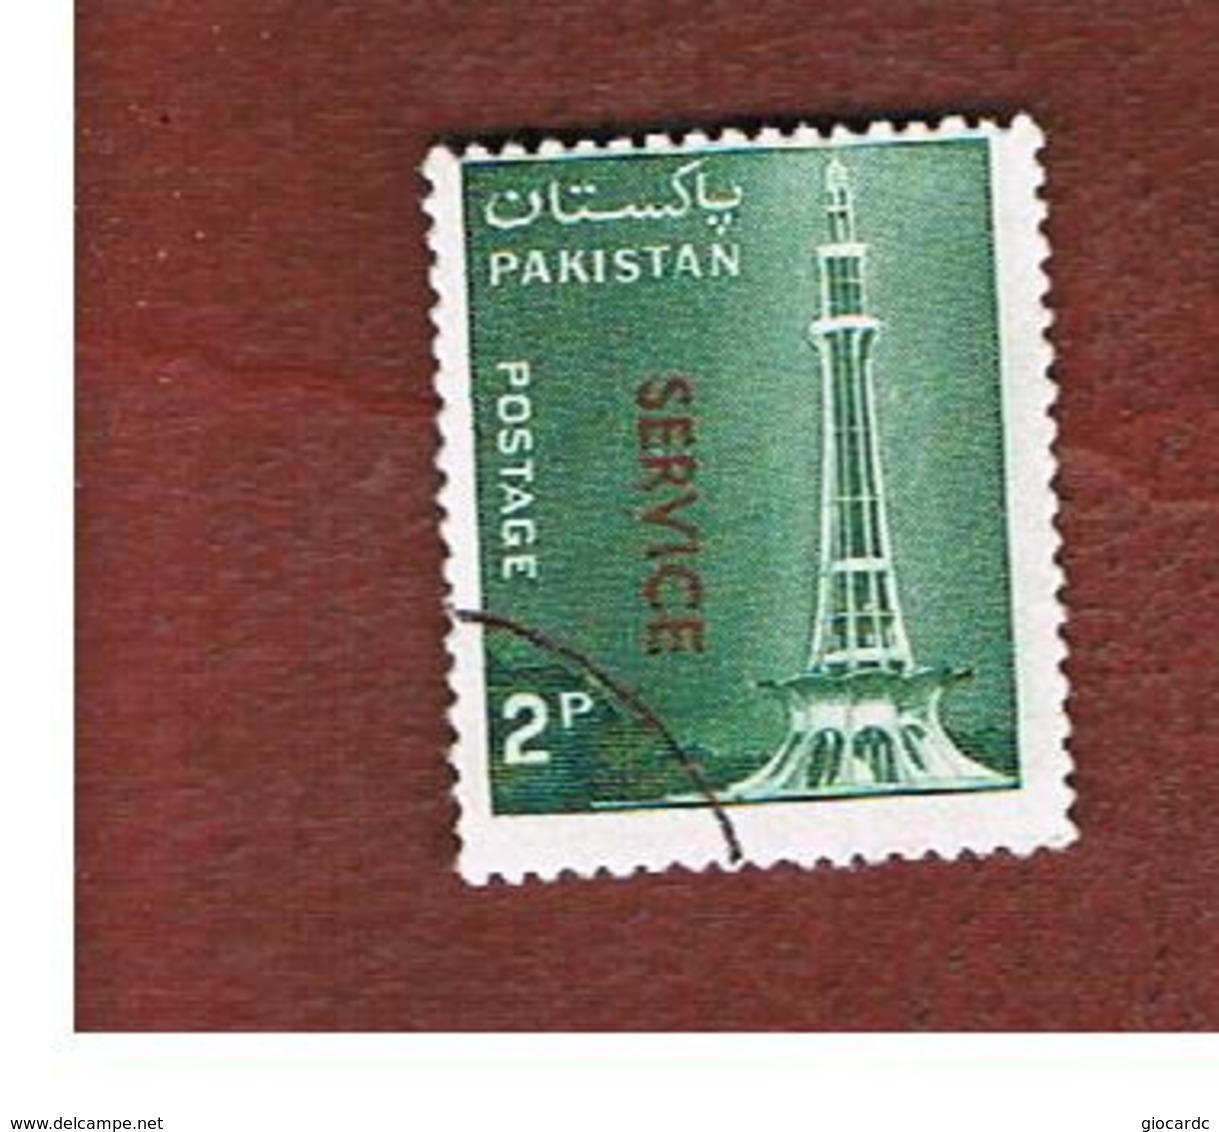 PAKISTAN  -  SG O109  -  1979 OFFICIAL STAMP: MINAR-E-PAKISTAN  (OVERPRINTED)    -  USED ° - Pakistan